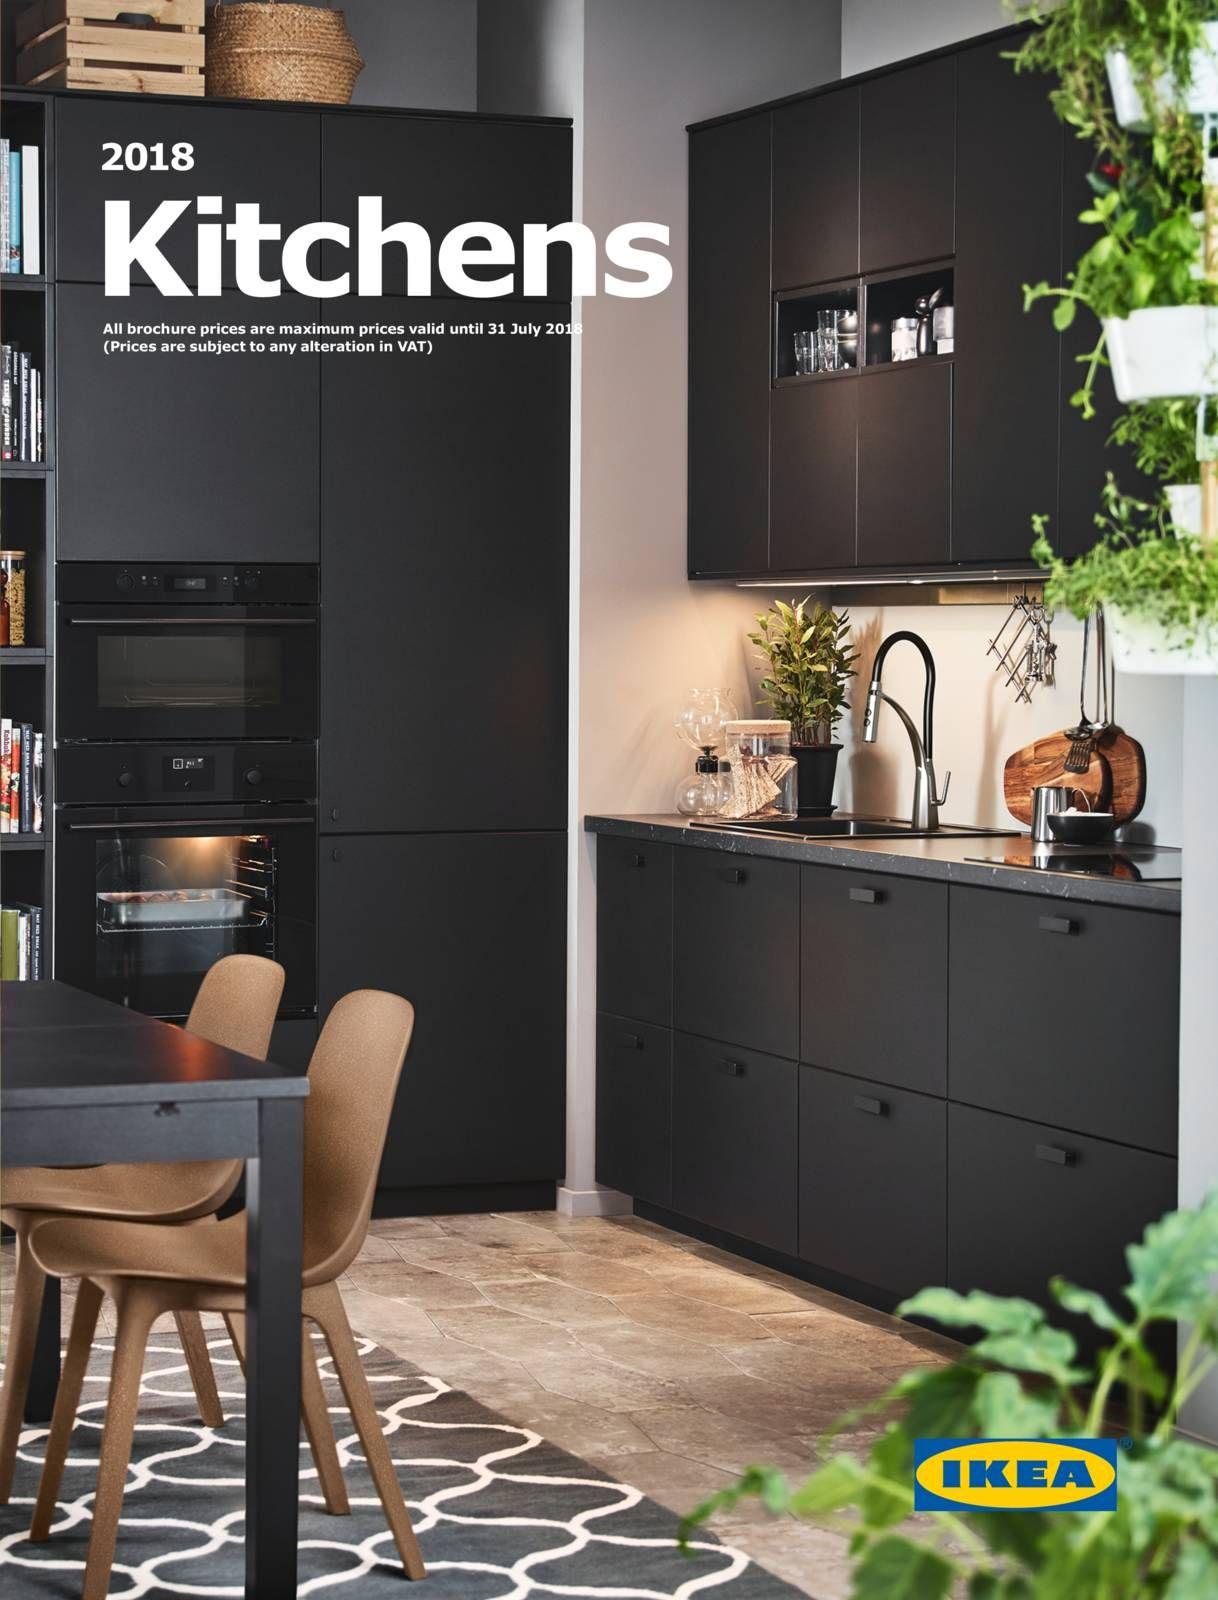 Ikea Kitchen Catalog 2018 Pdf Kitchen 2018 Ikea Kitchen